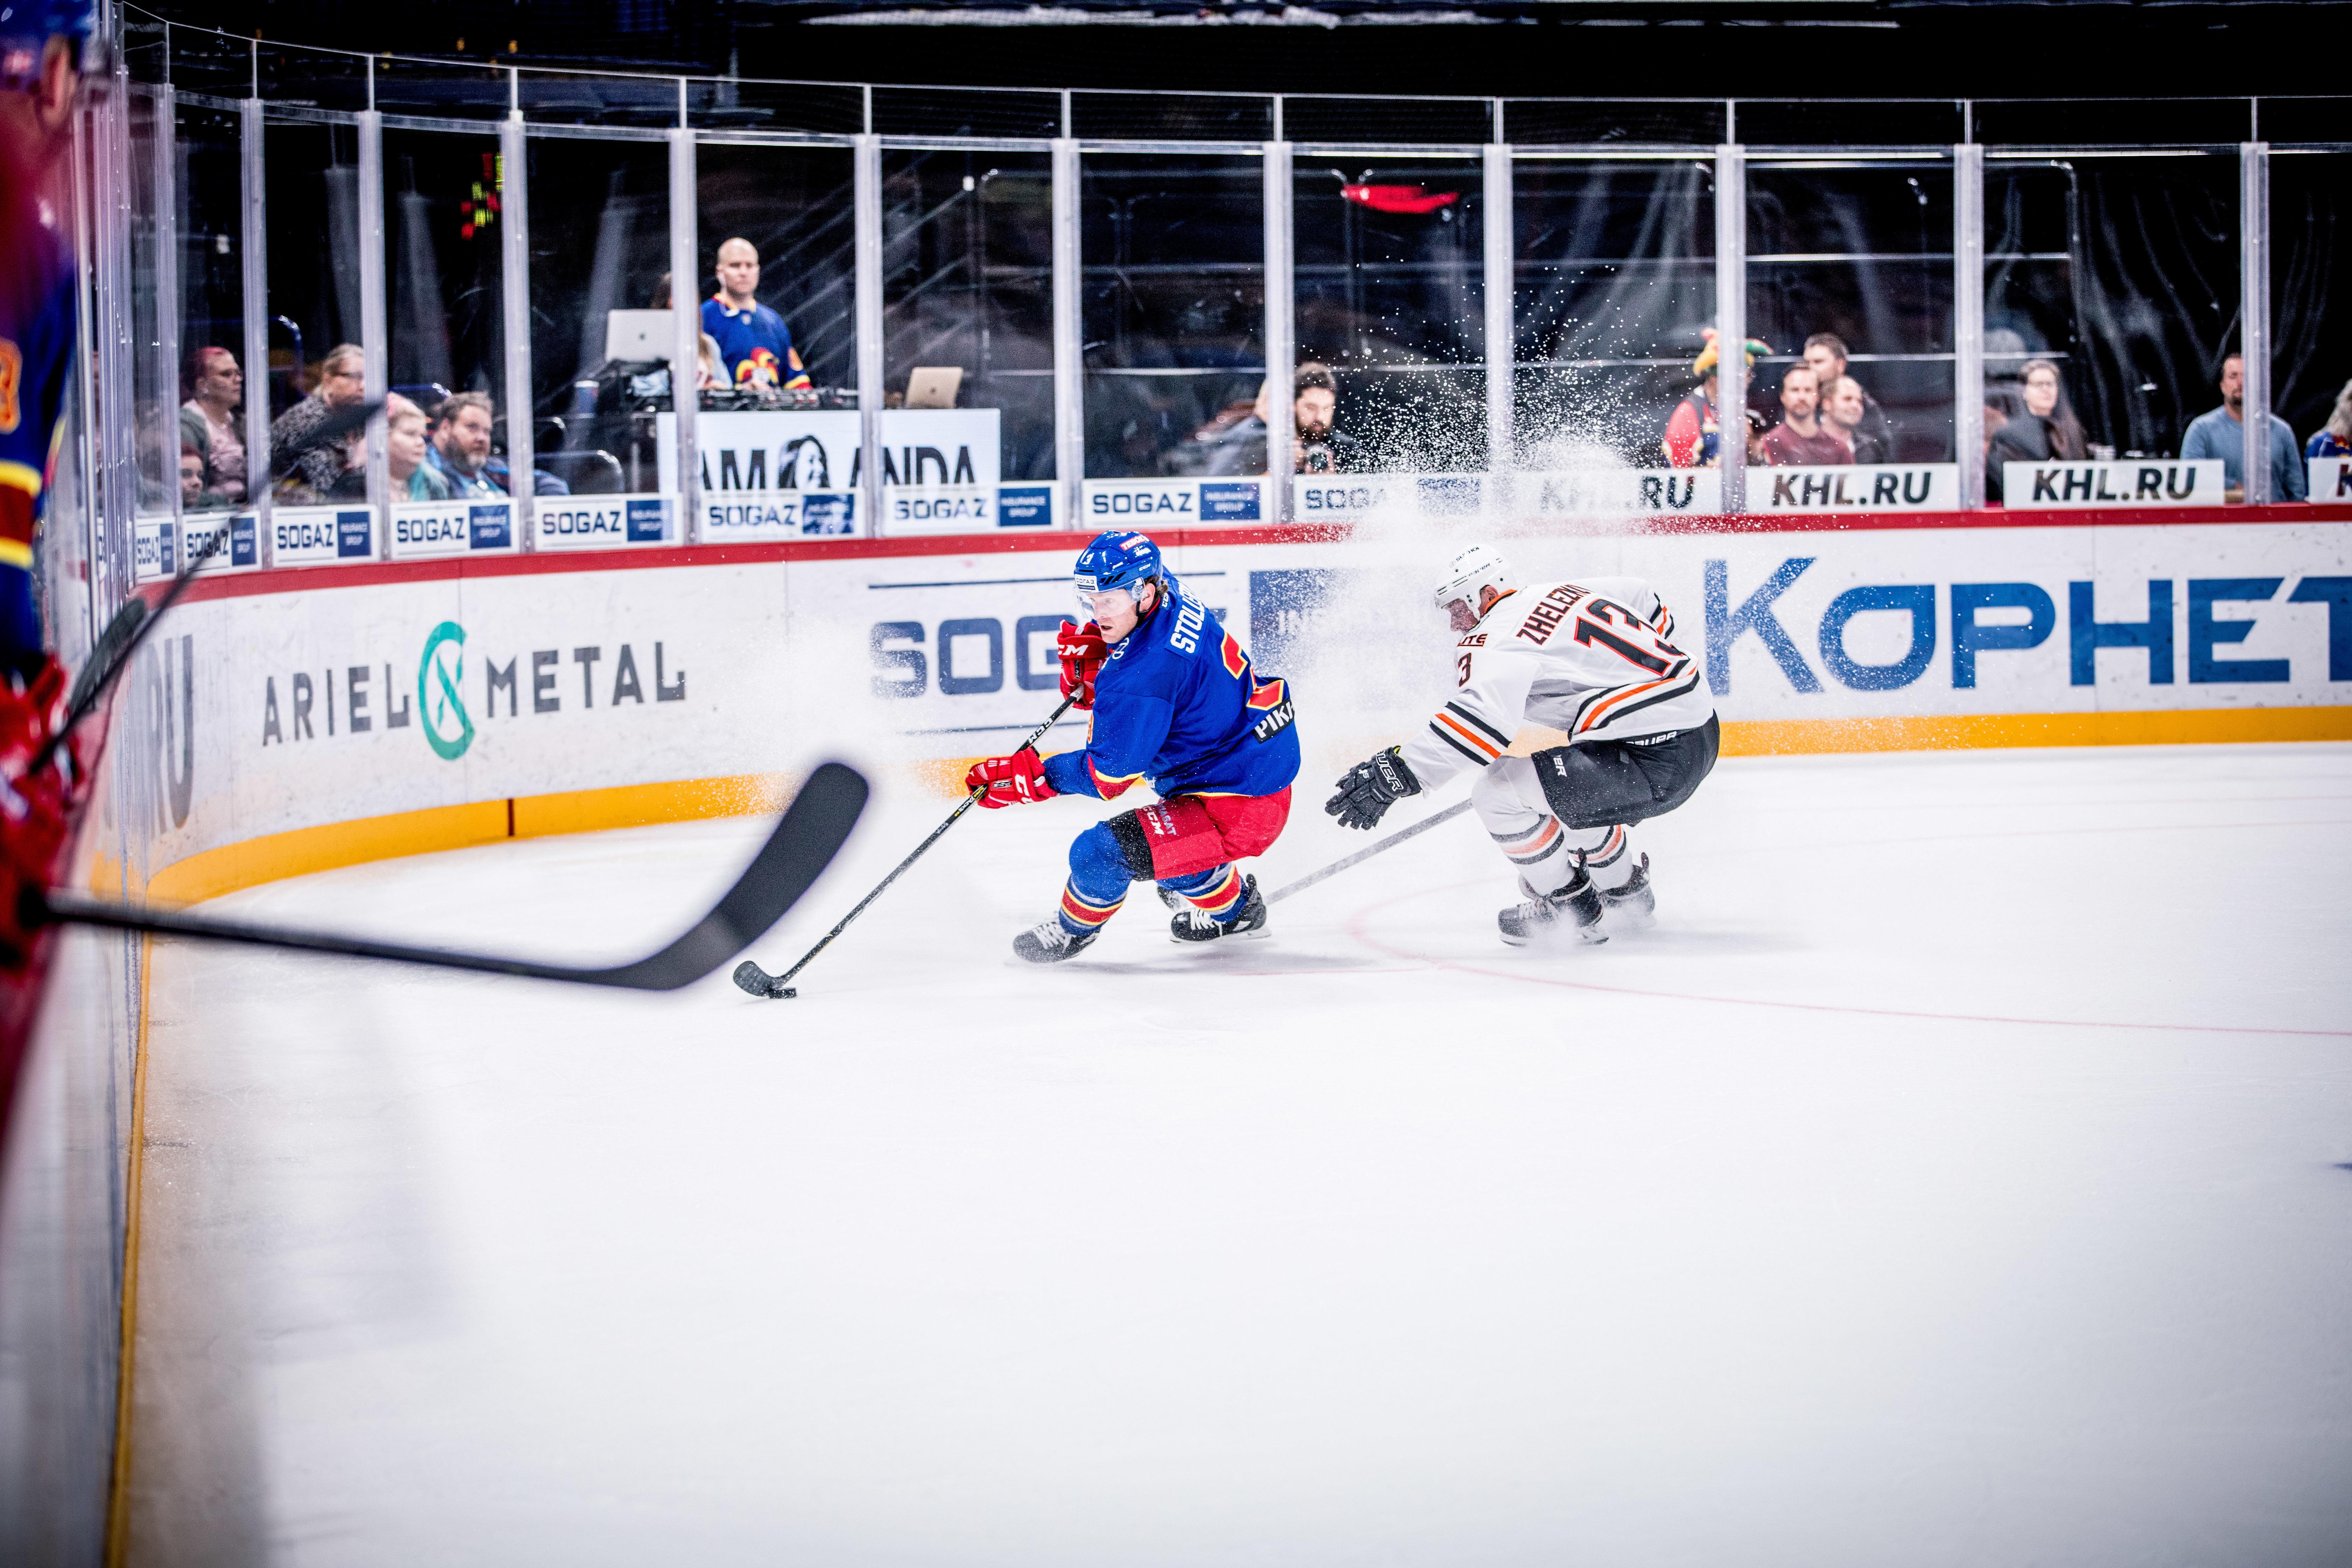 Прогноз на КХЛ: Сочи – Амур – 7 сентября 2018 года